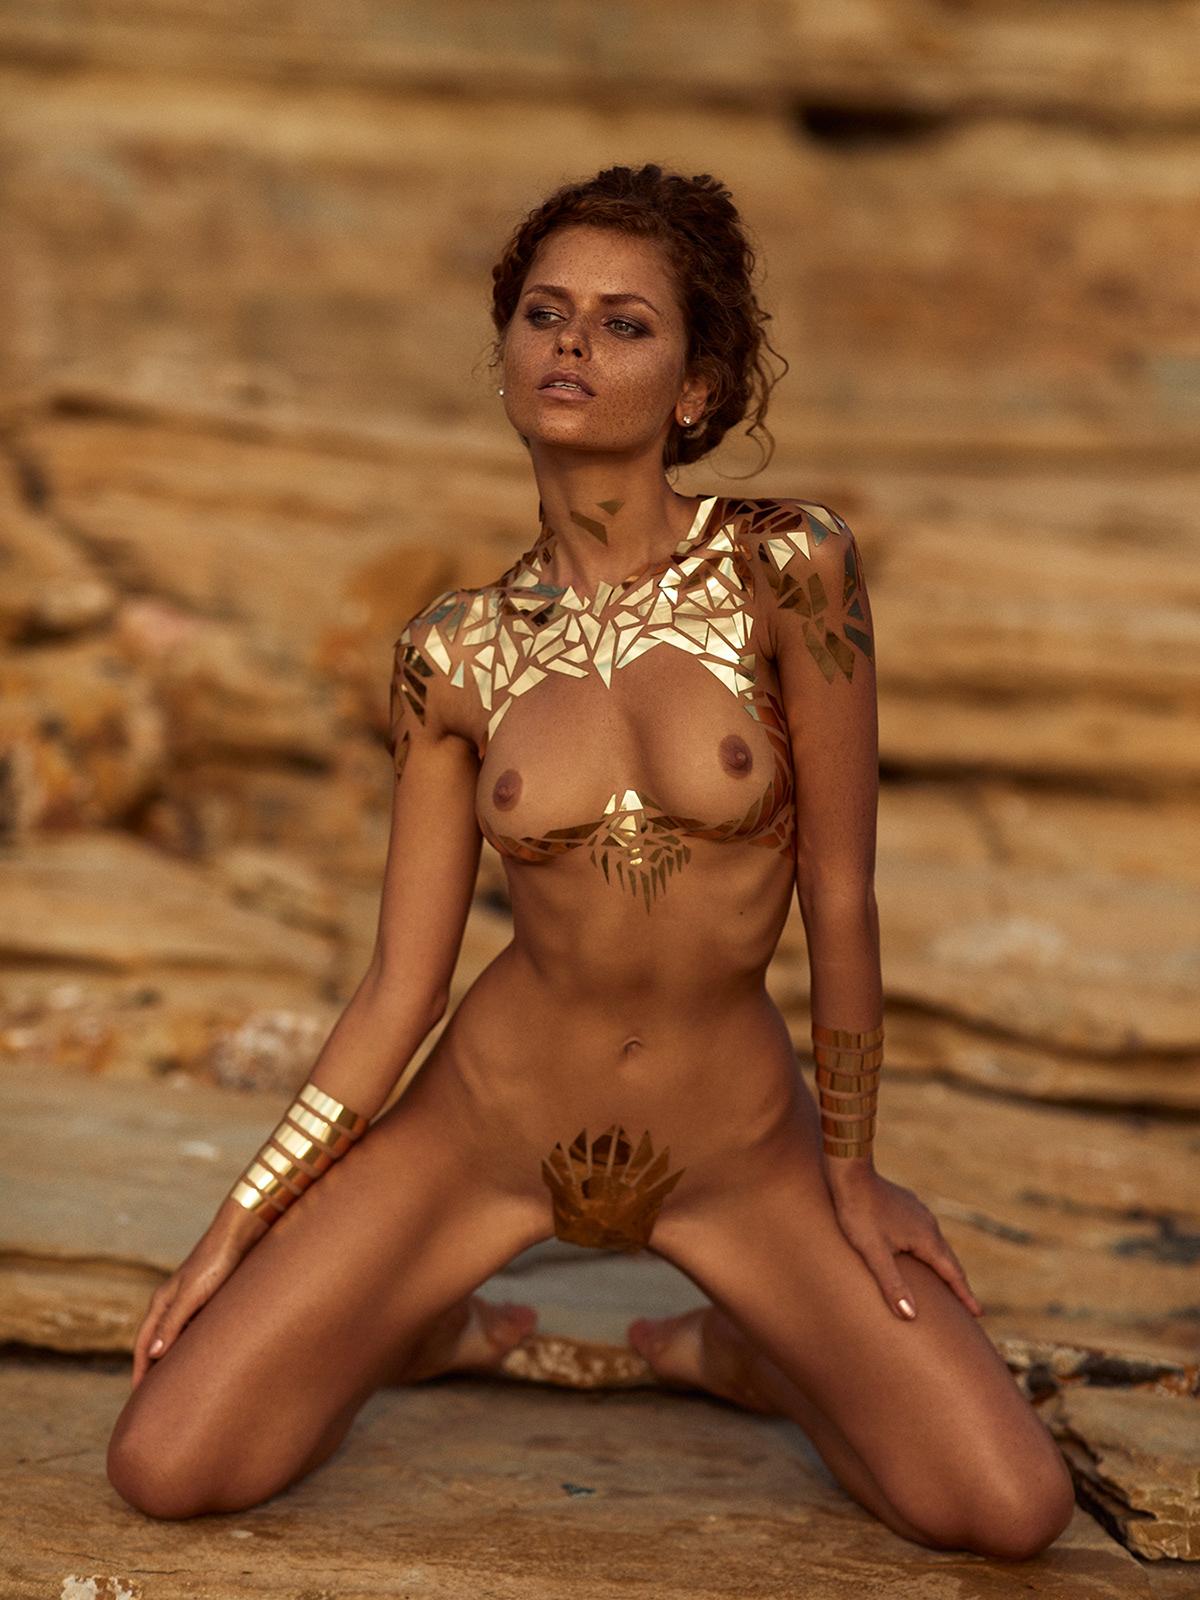 The Golden Girl / Юлия Ярошенко фотограф Joakim Karlsson